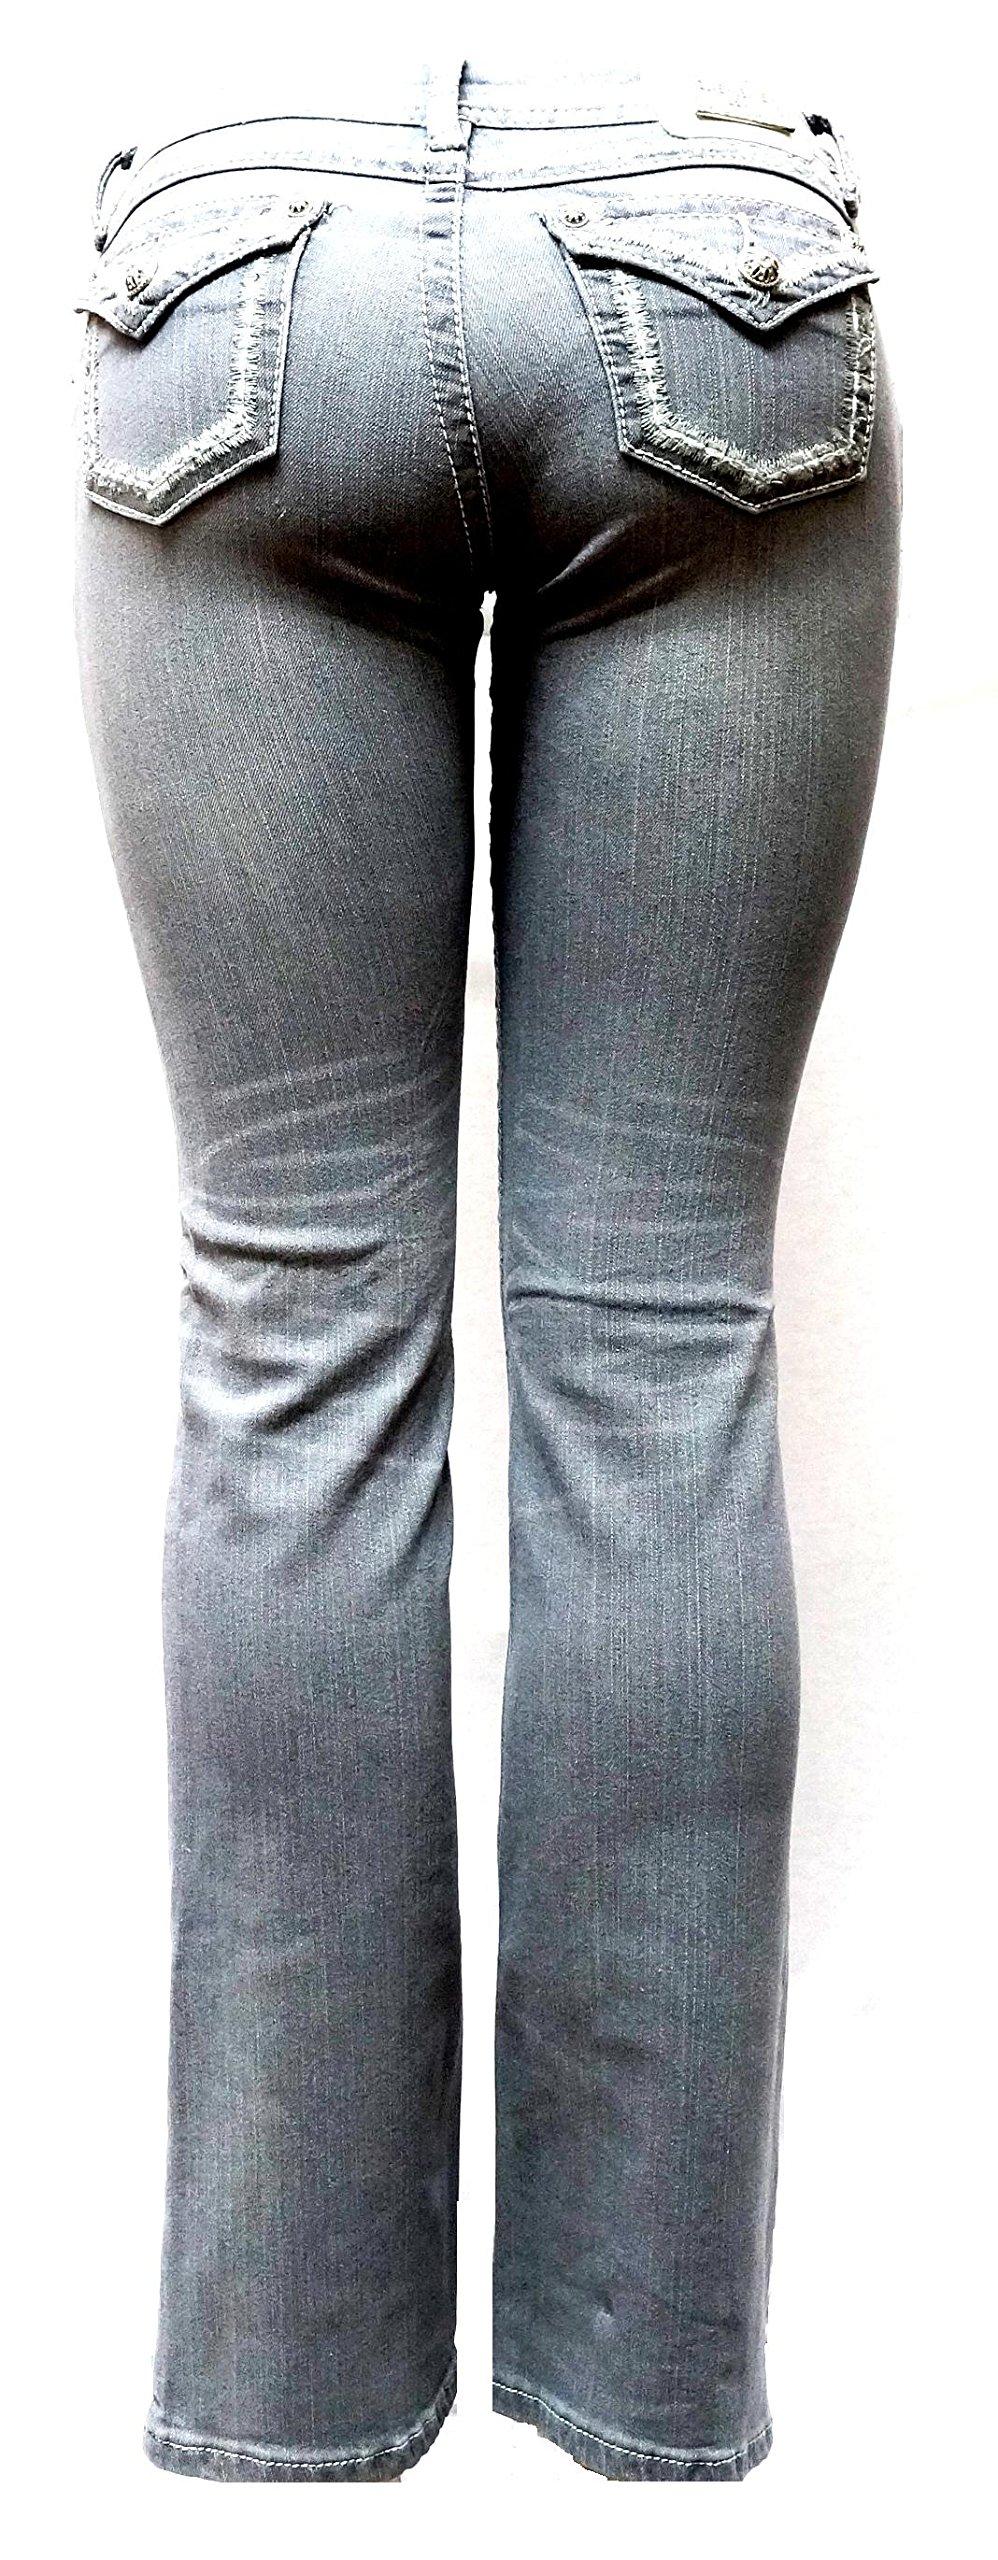 Jully-M Premium Sexy Women's Curvy Basic Bootcut Blue Denim Jeans Stretch Pants (9, Clash Jeans LP9200 Gray/Silver)